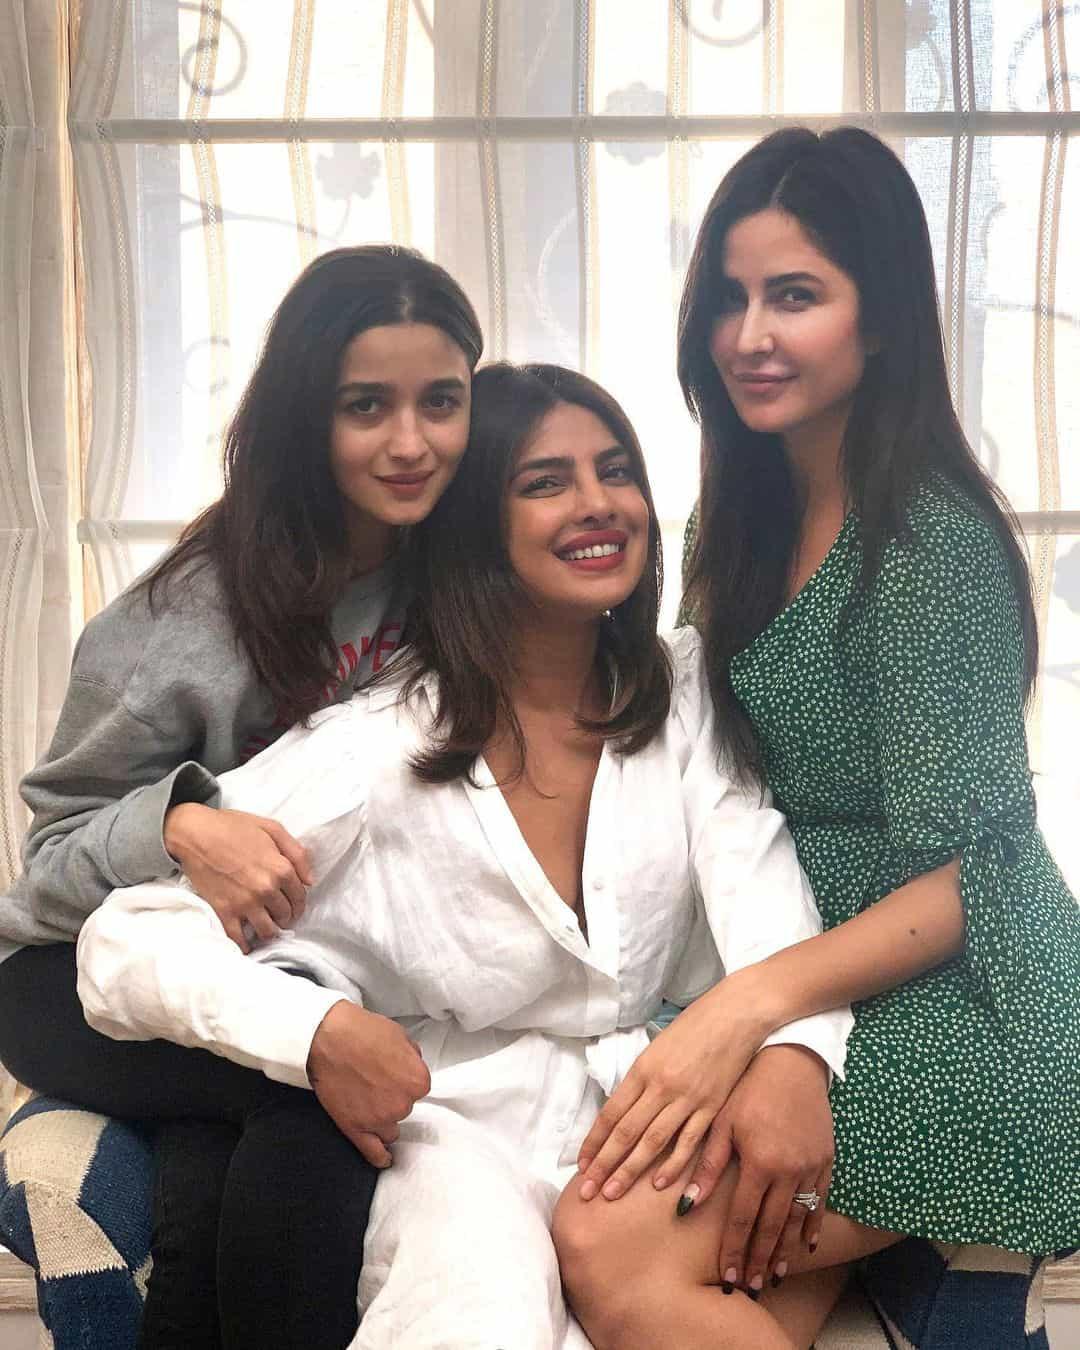 Actress Gossips: Alia, Katrina, Priyanka Can't Stop Talking About their Road Trip